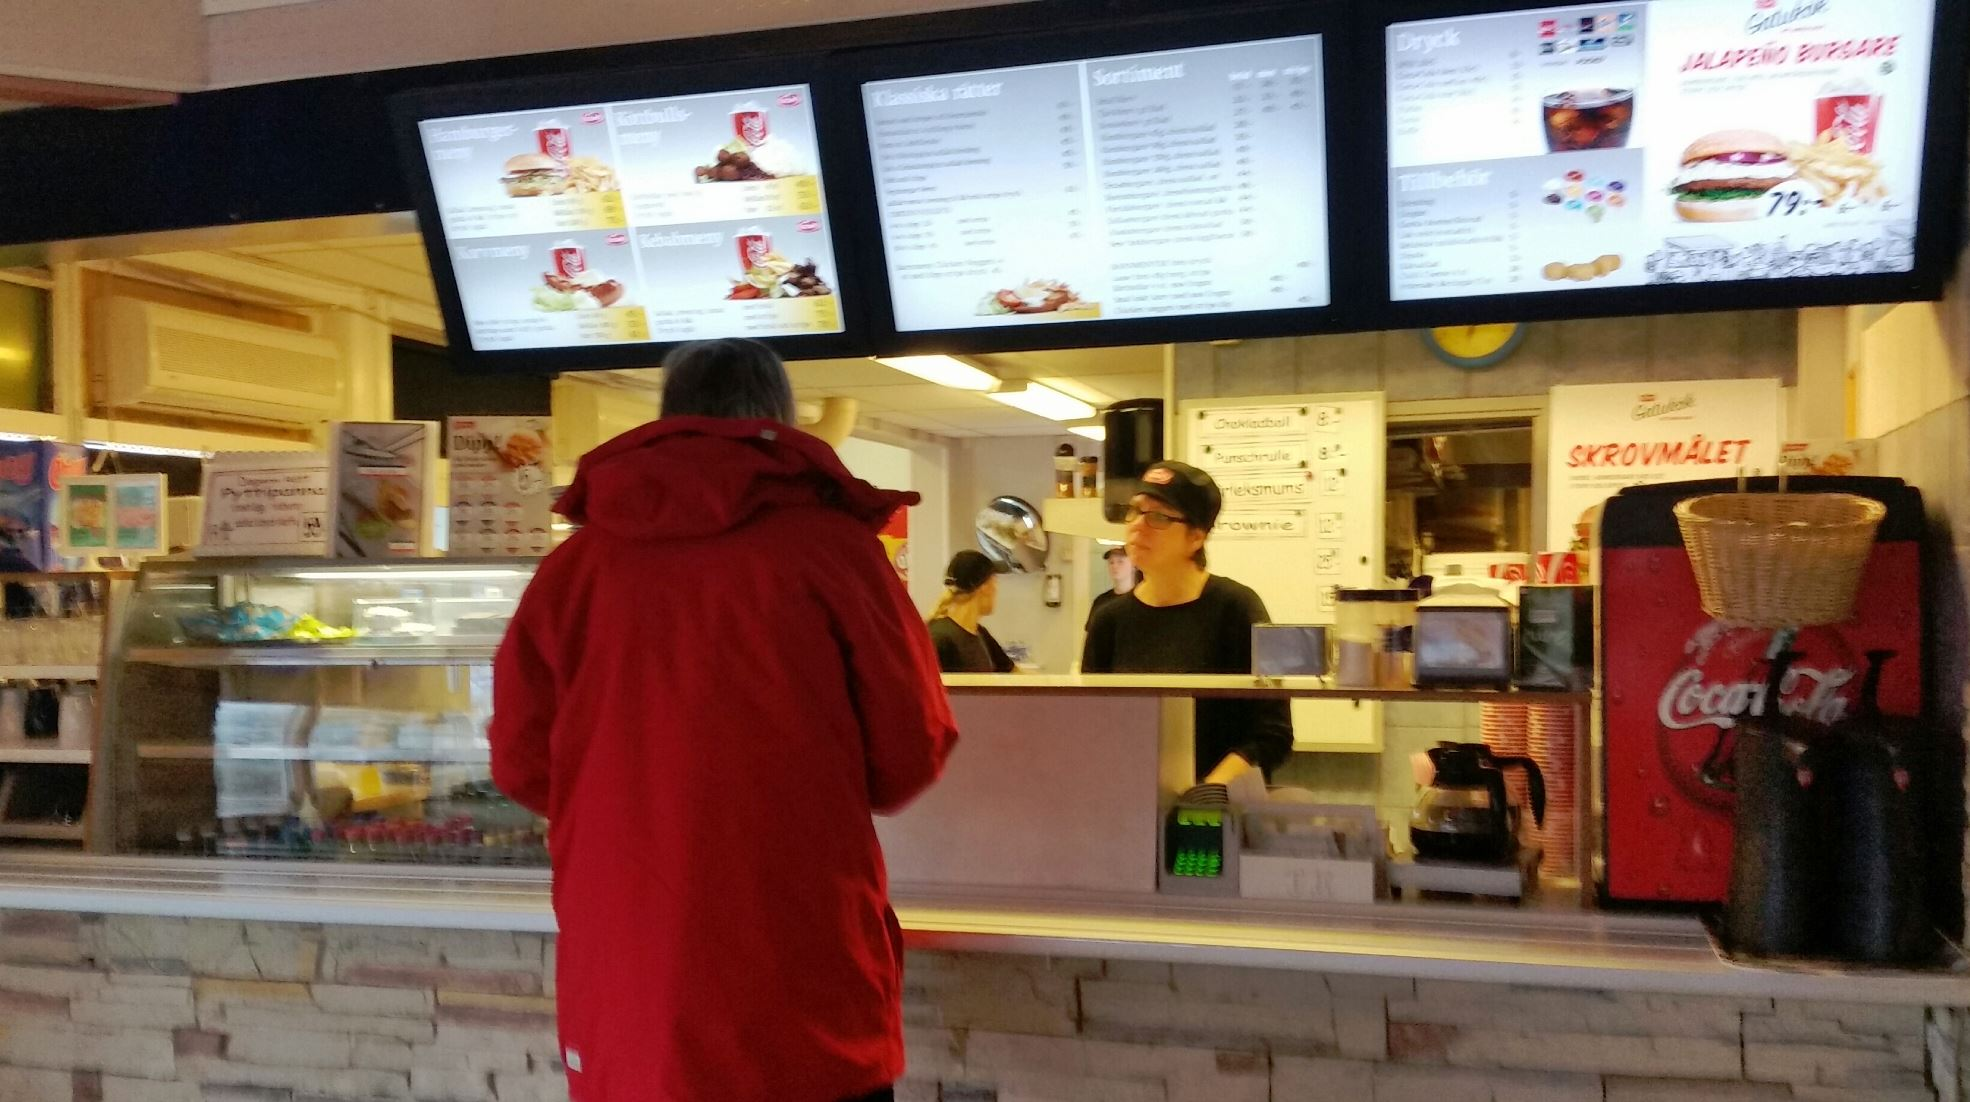 Lasses Kiosk & Grill